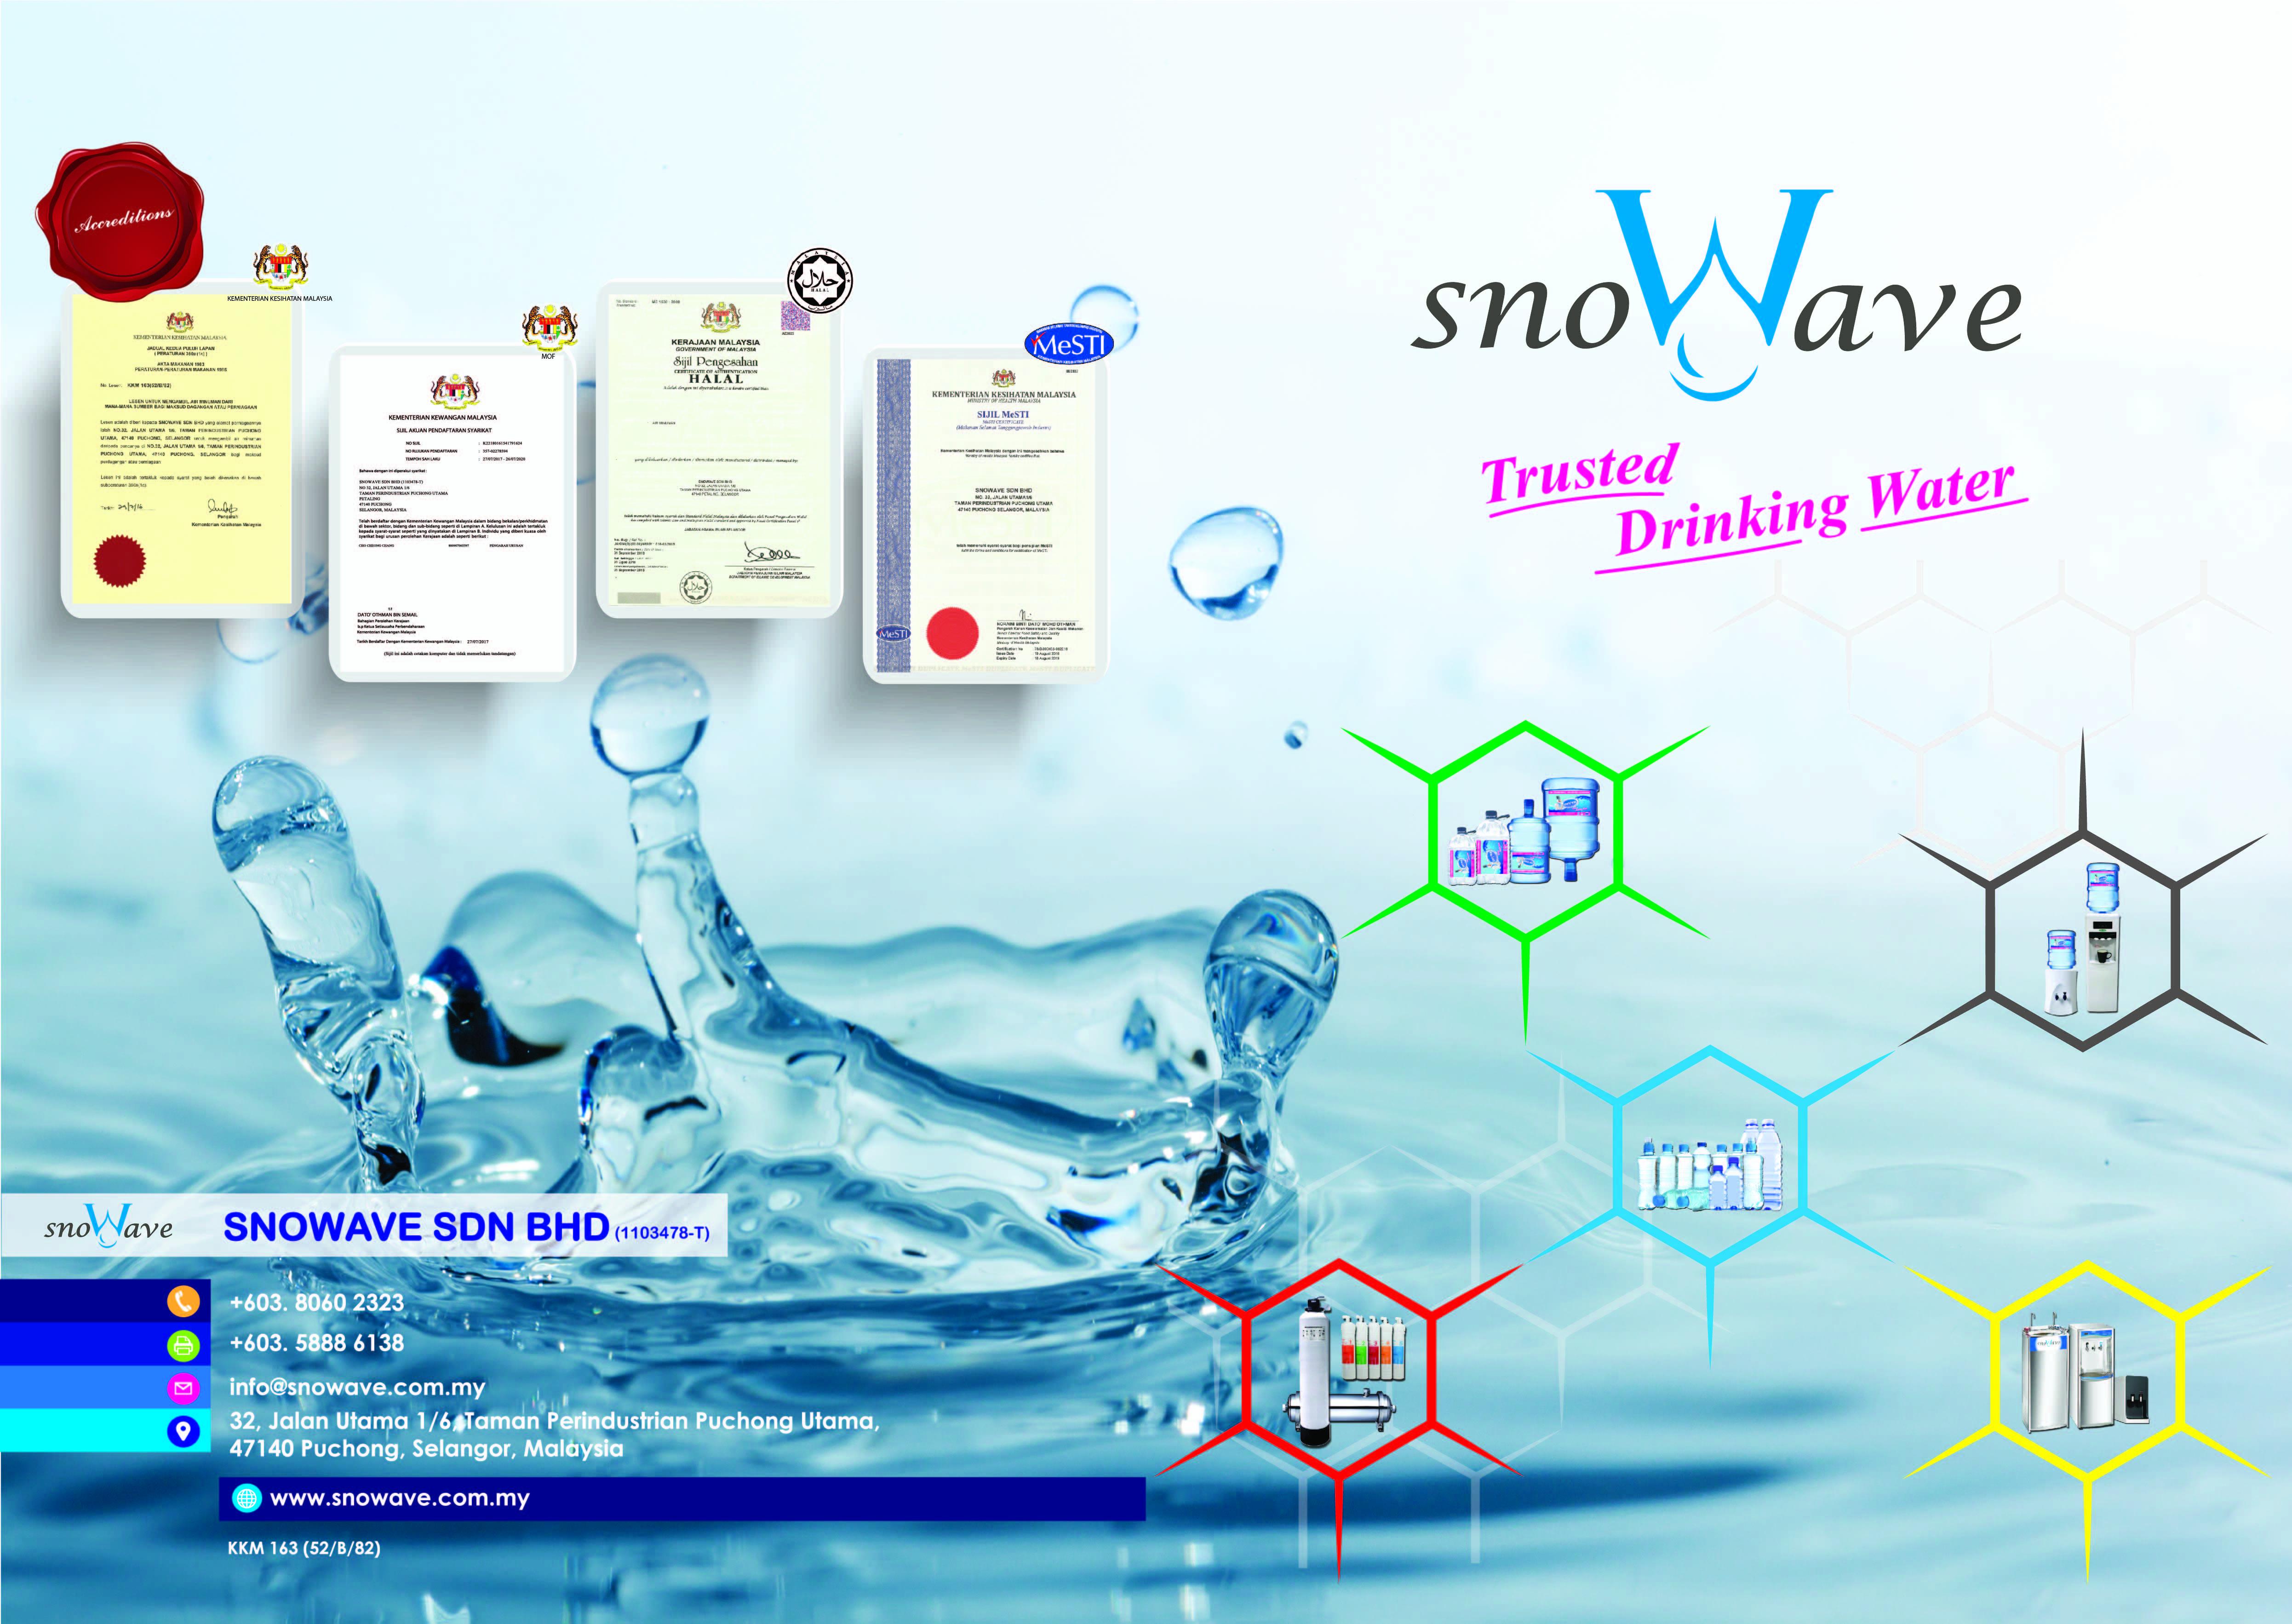 Snowave Sdn Bhd